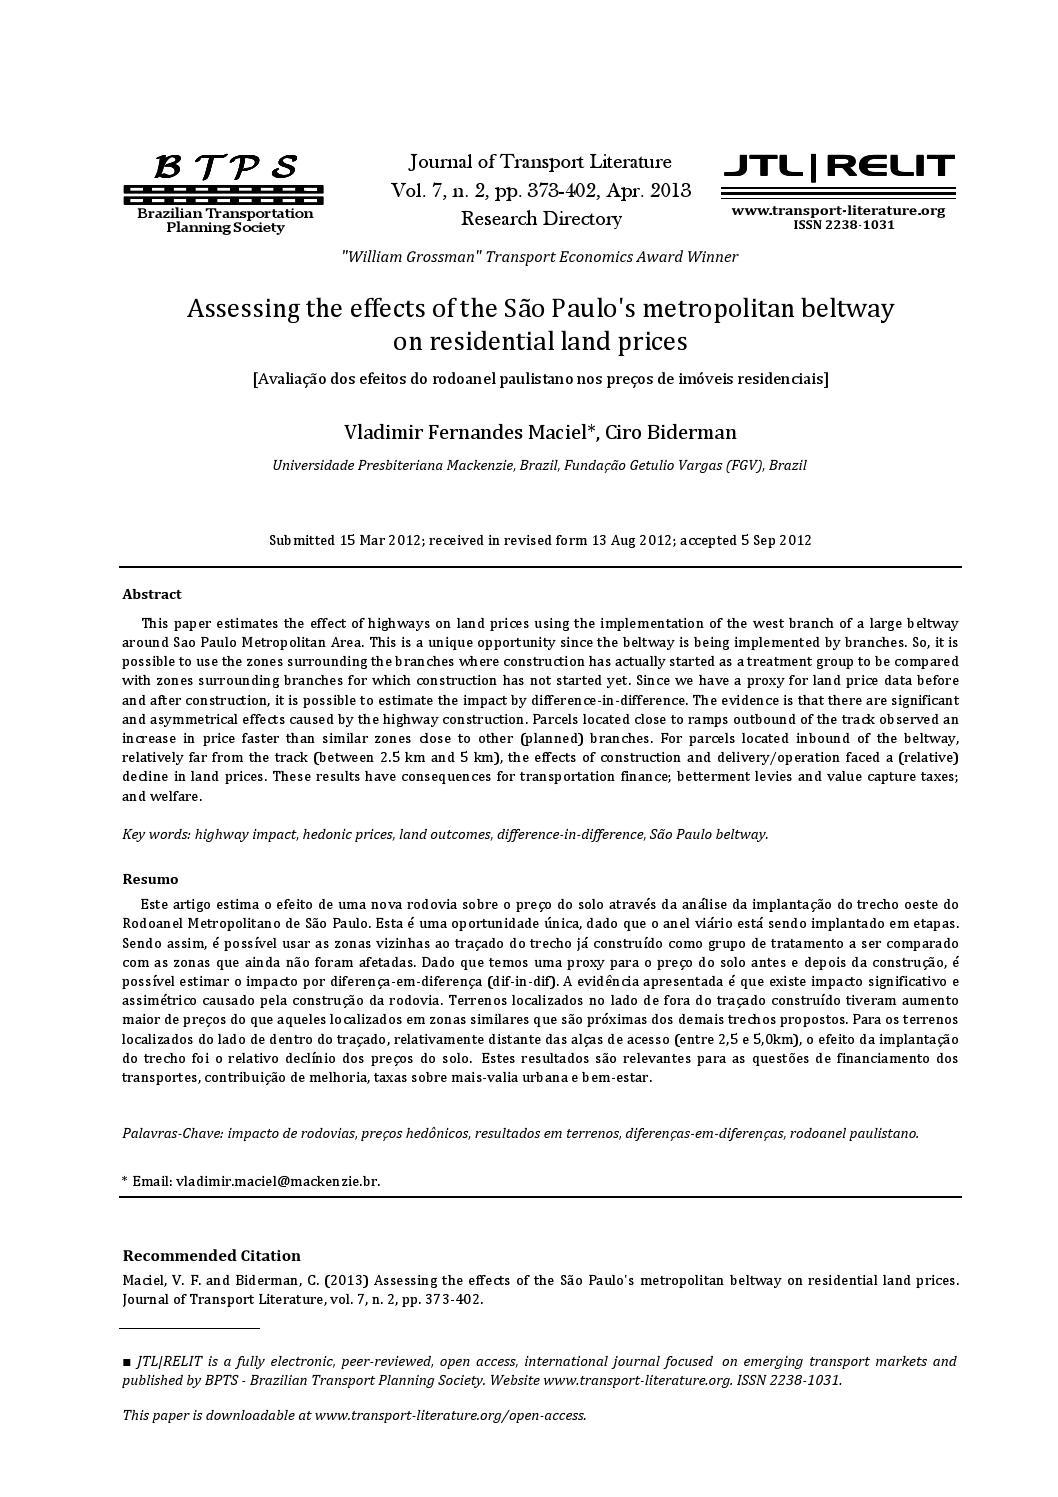 Jtl v07n02p19 by Journal of Transport Literature - issuu